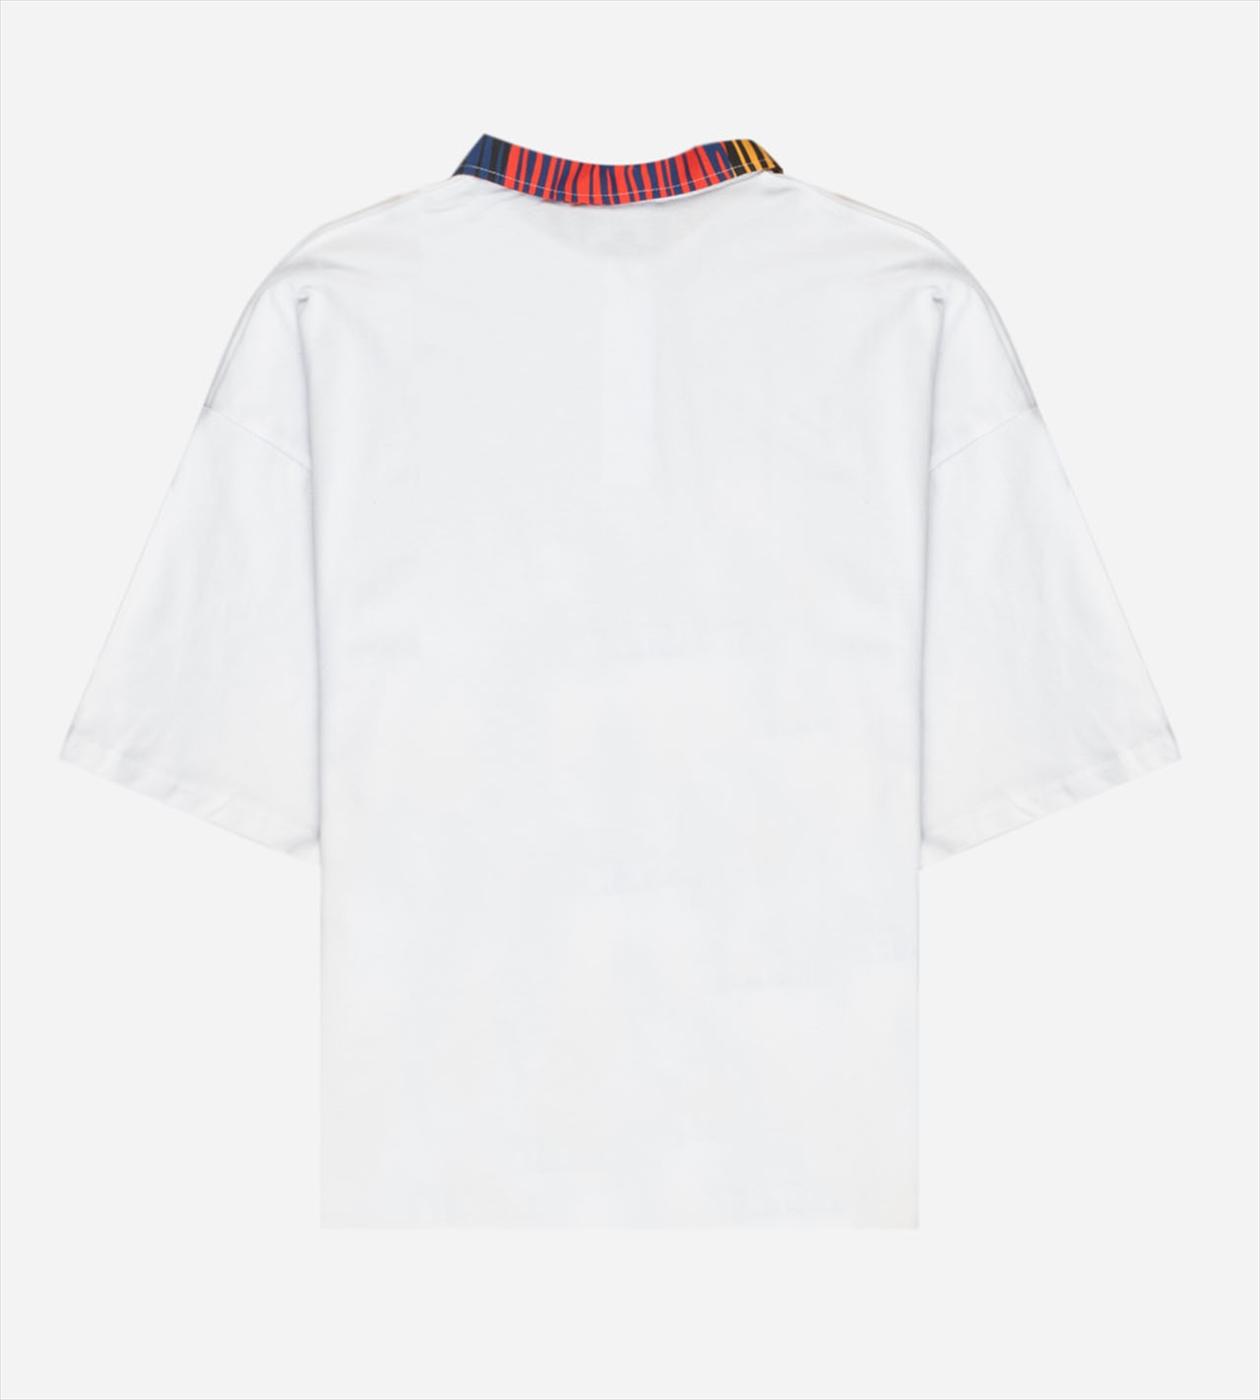 【PAS DE MER/パドゥメ】TIGER OVERSIZE POLO  ポロシャツ / WHITE